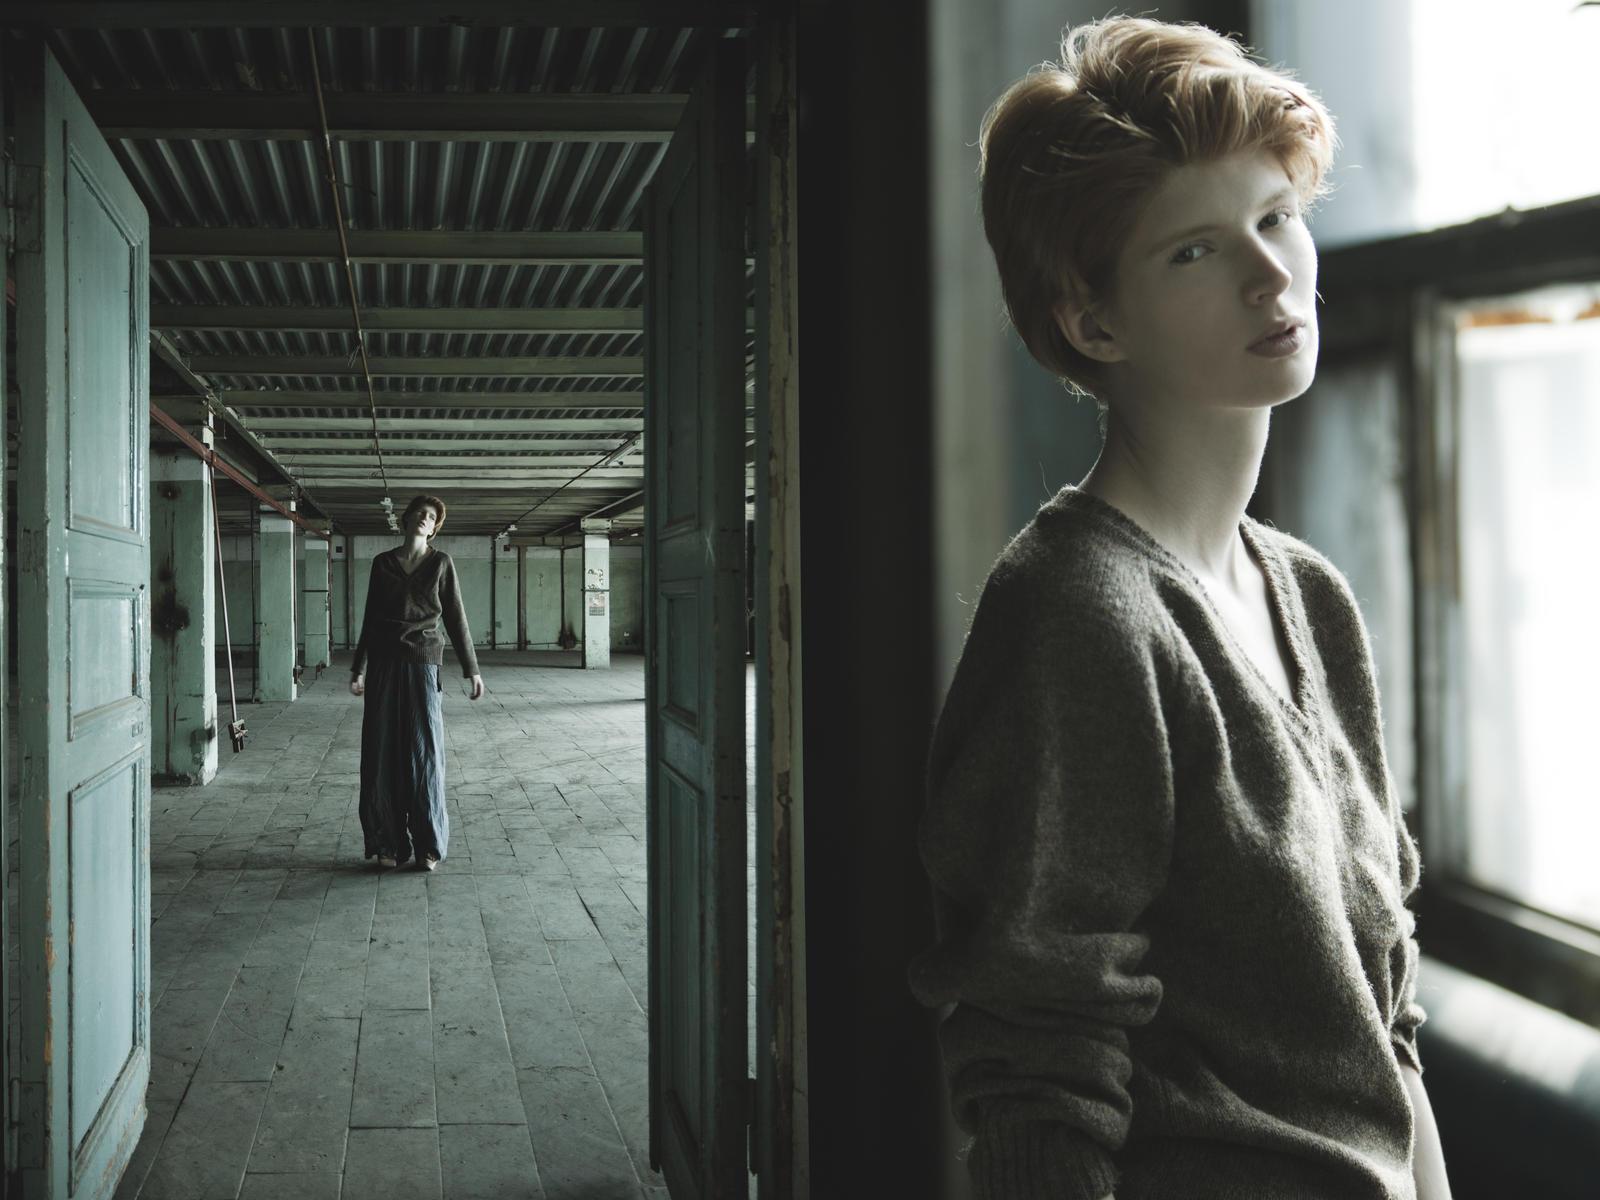 Ginger9 by kefirux